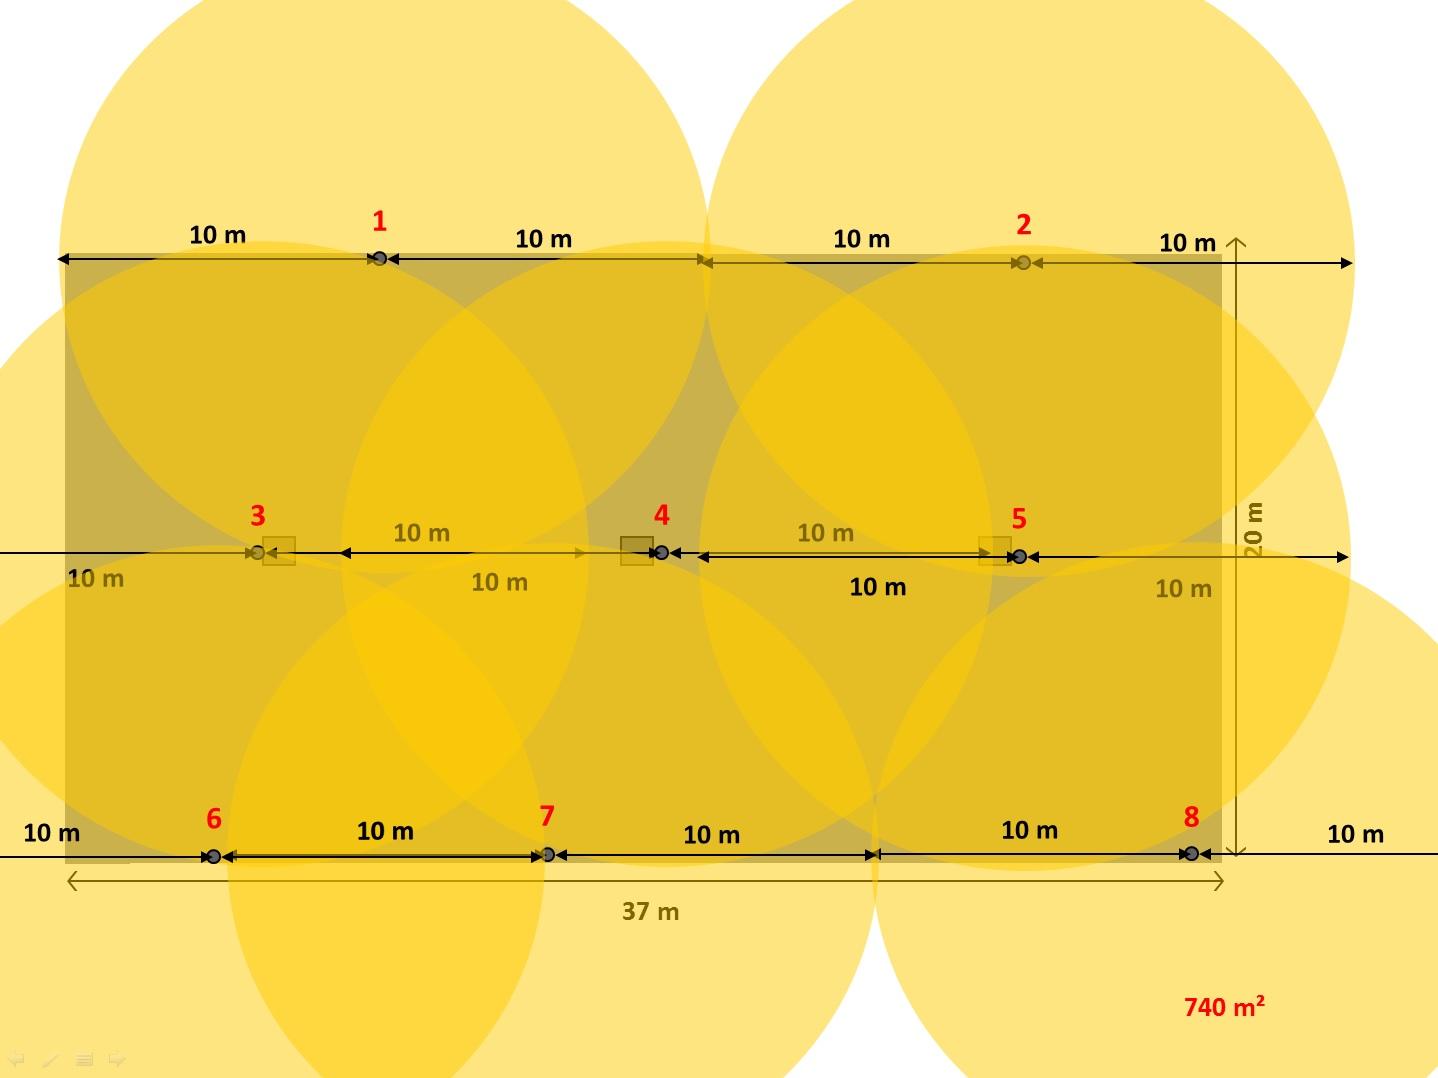 02-de-fr-it_CH-Sikafloor-ASE-Set-Erdung-Ableitpunkte-1000